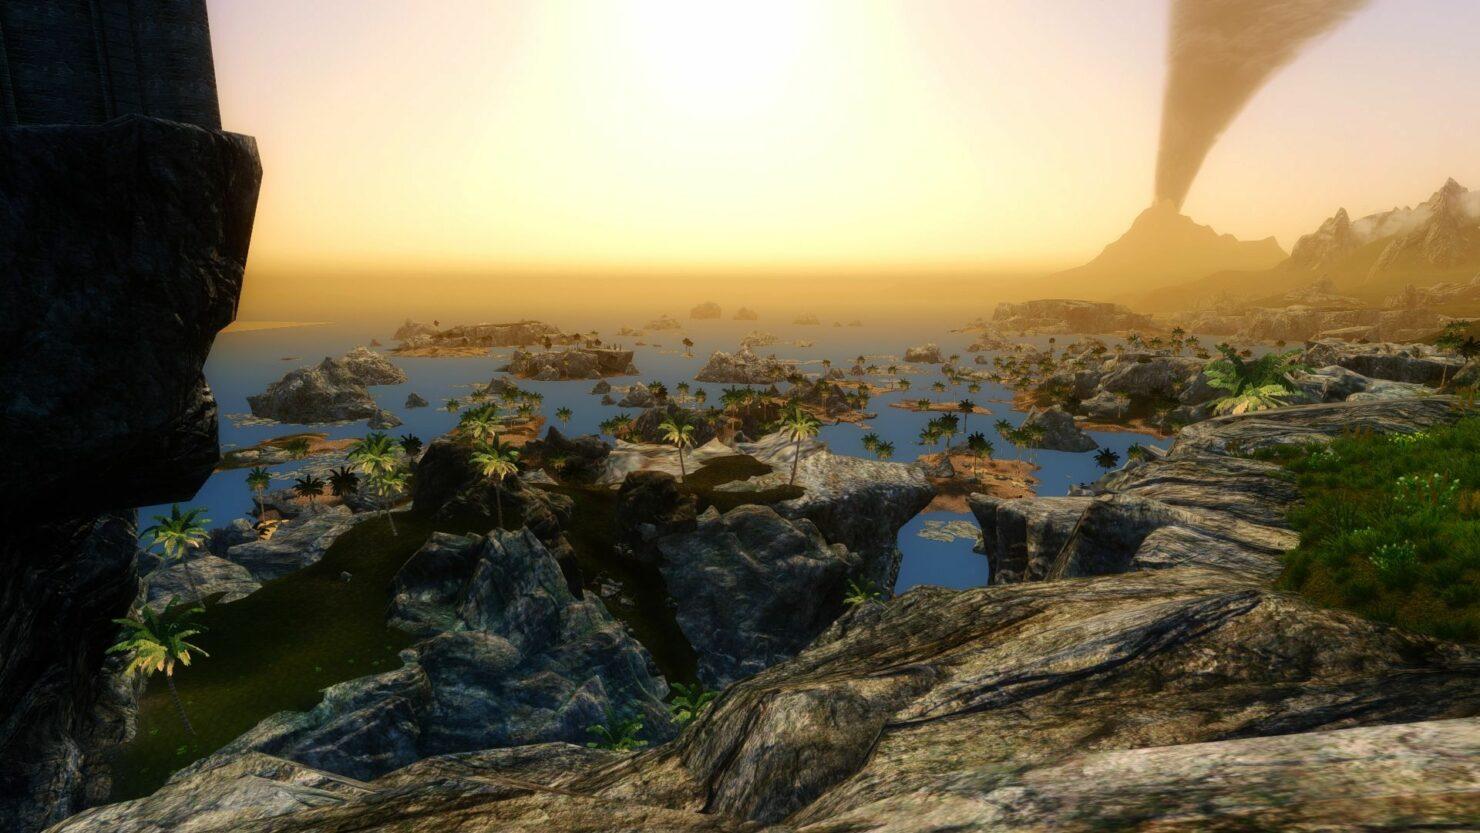 elder-scrolls-v-skyrim-legendary-edition-project-rainforest-mod-update-7